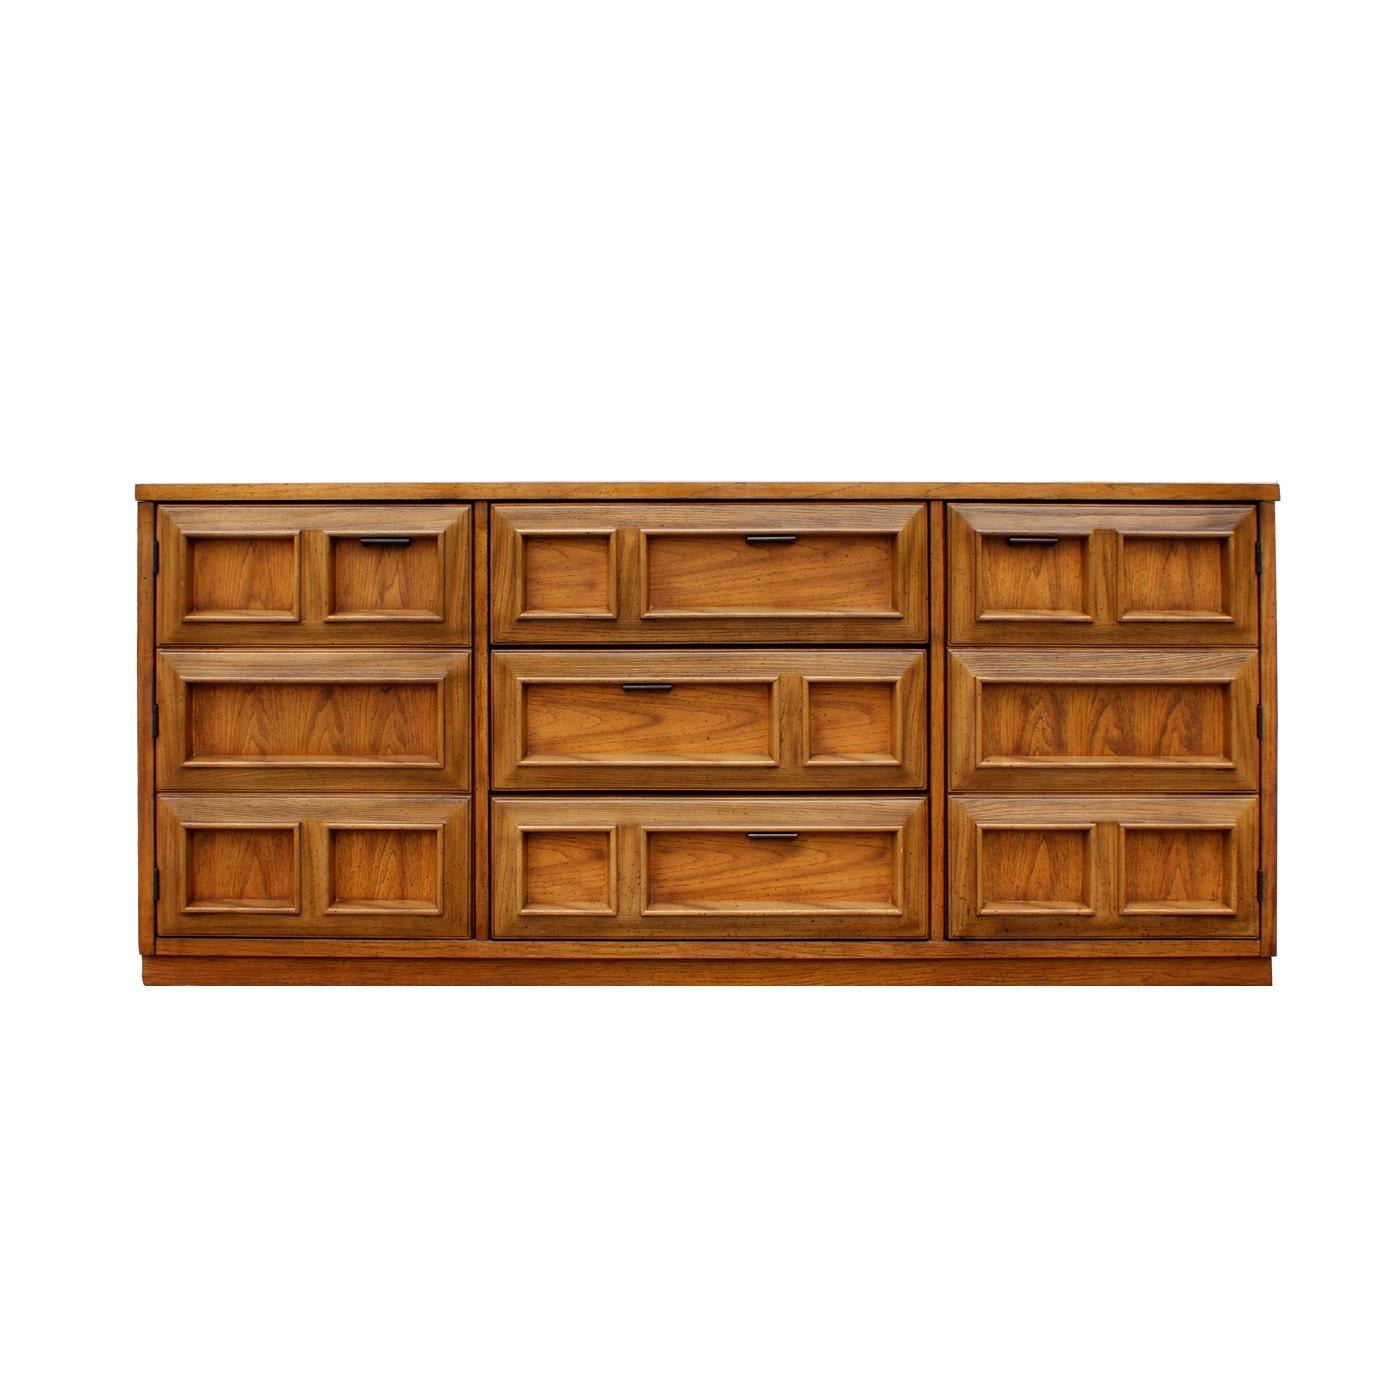 Bassett Mid Century Modern Geometric Credenza Cabinet